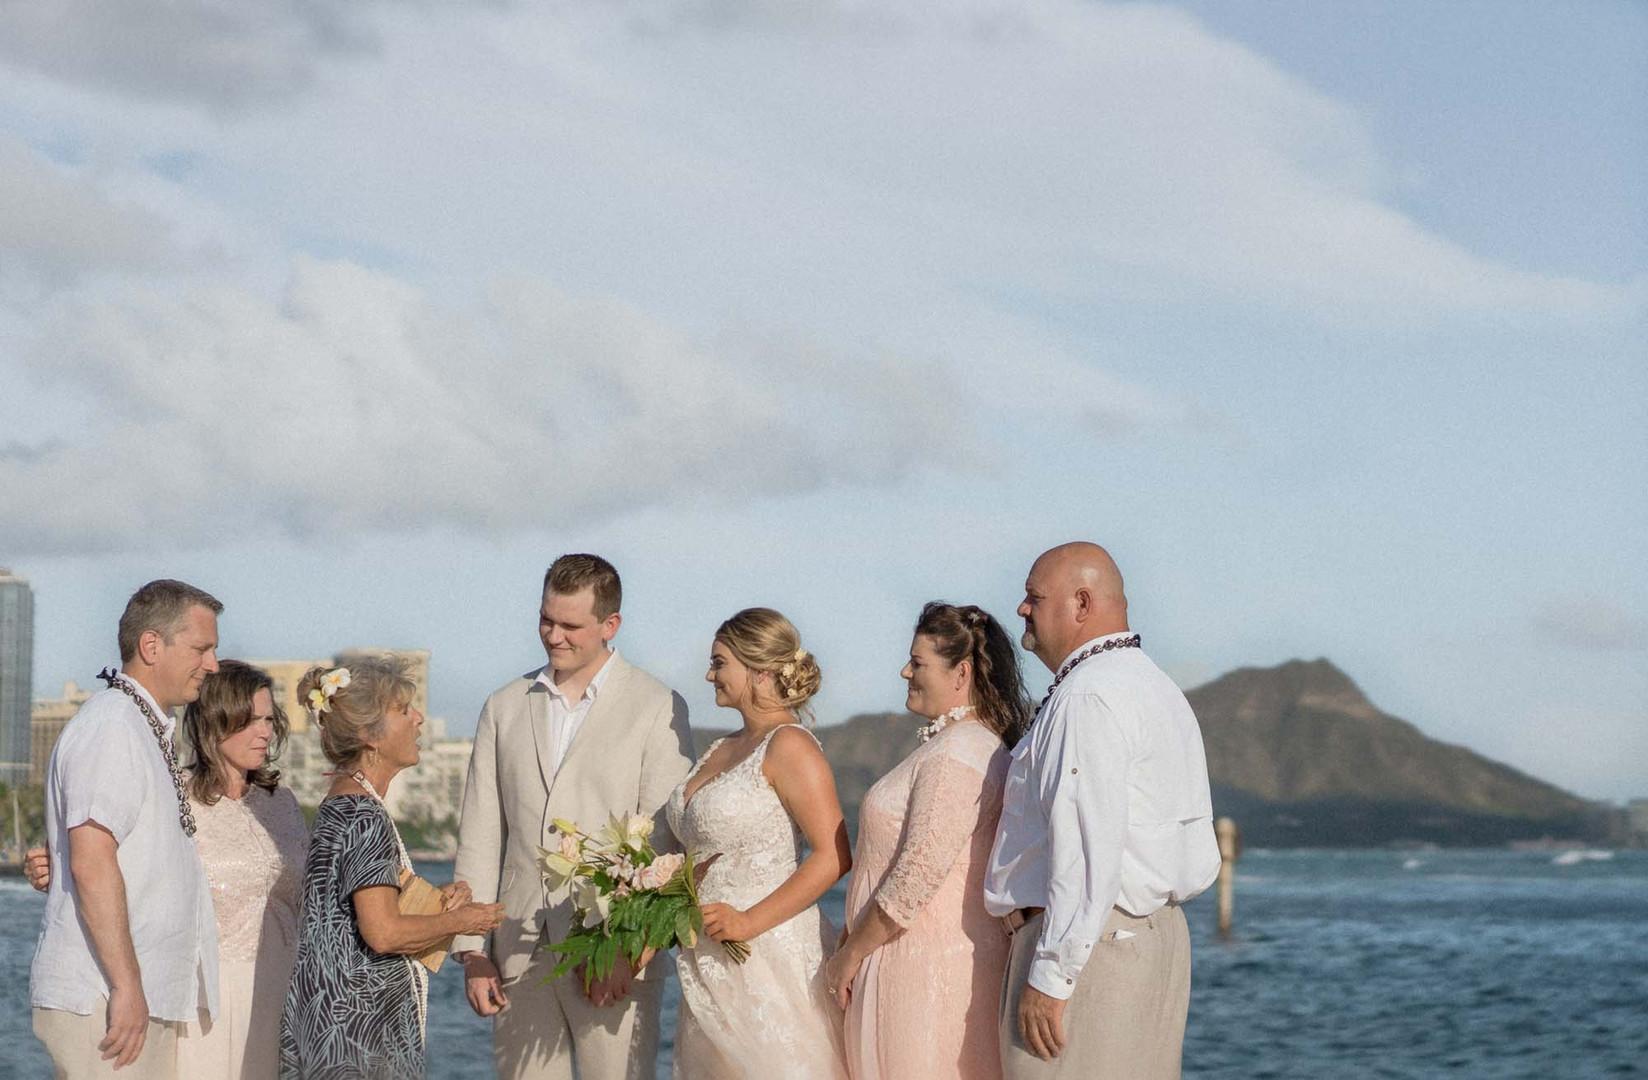 Outdoor Wedding Venues in Hawaii